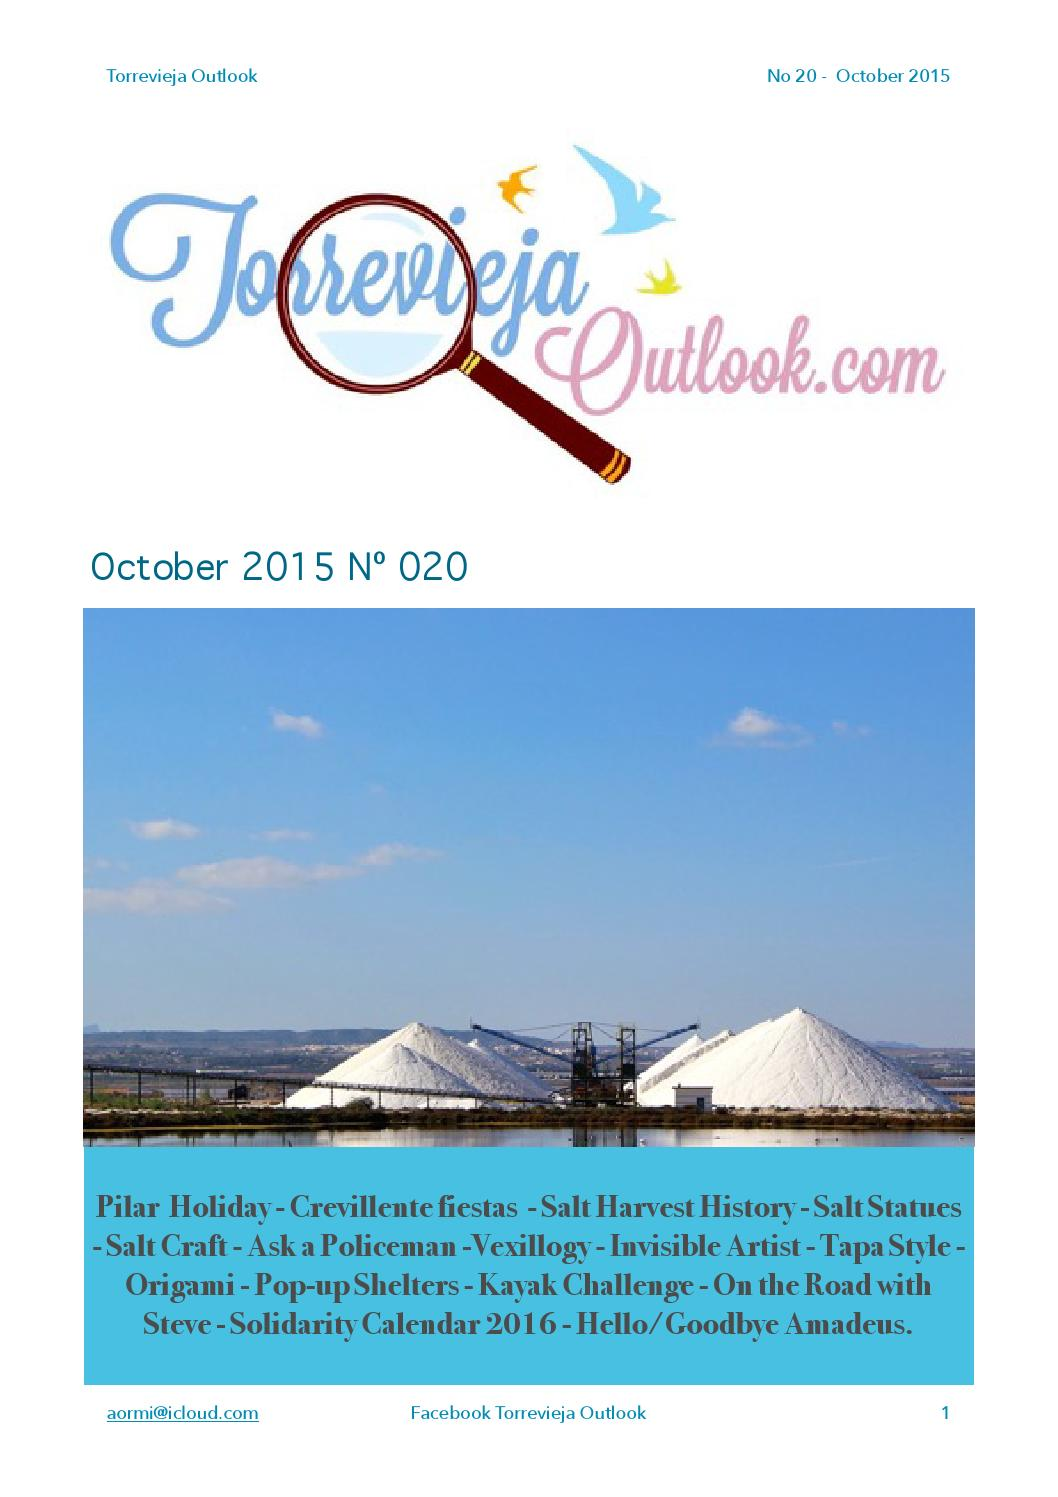 020 october 2015 torrevieja outlook